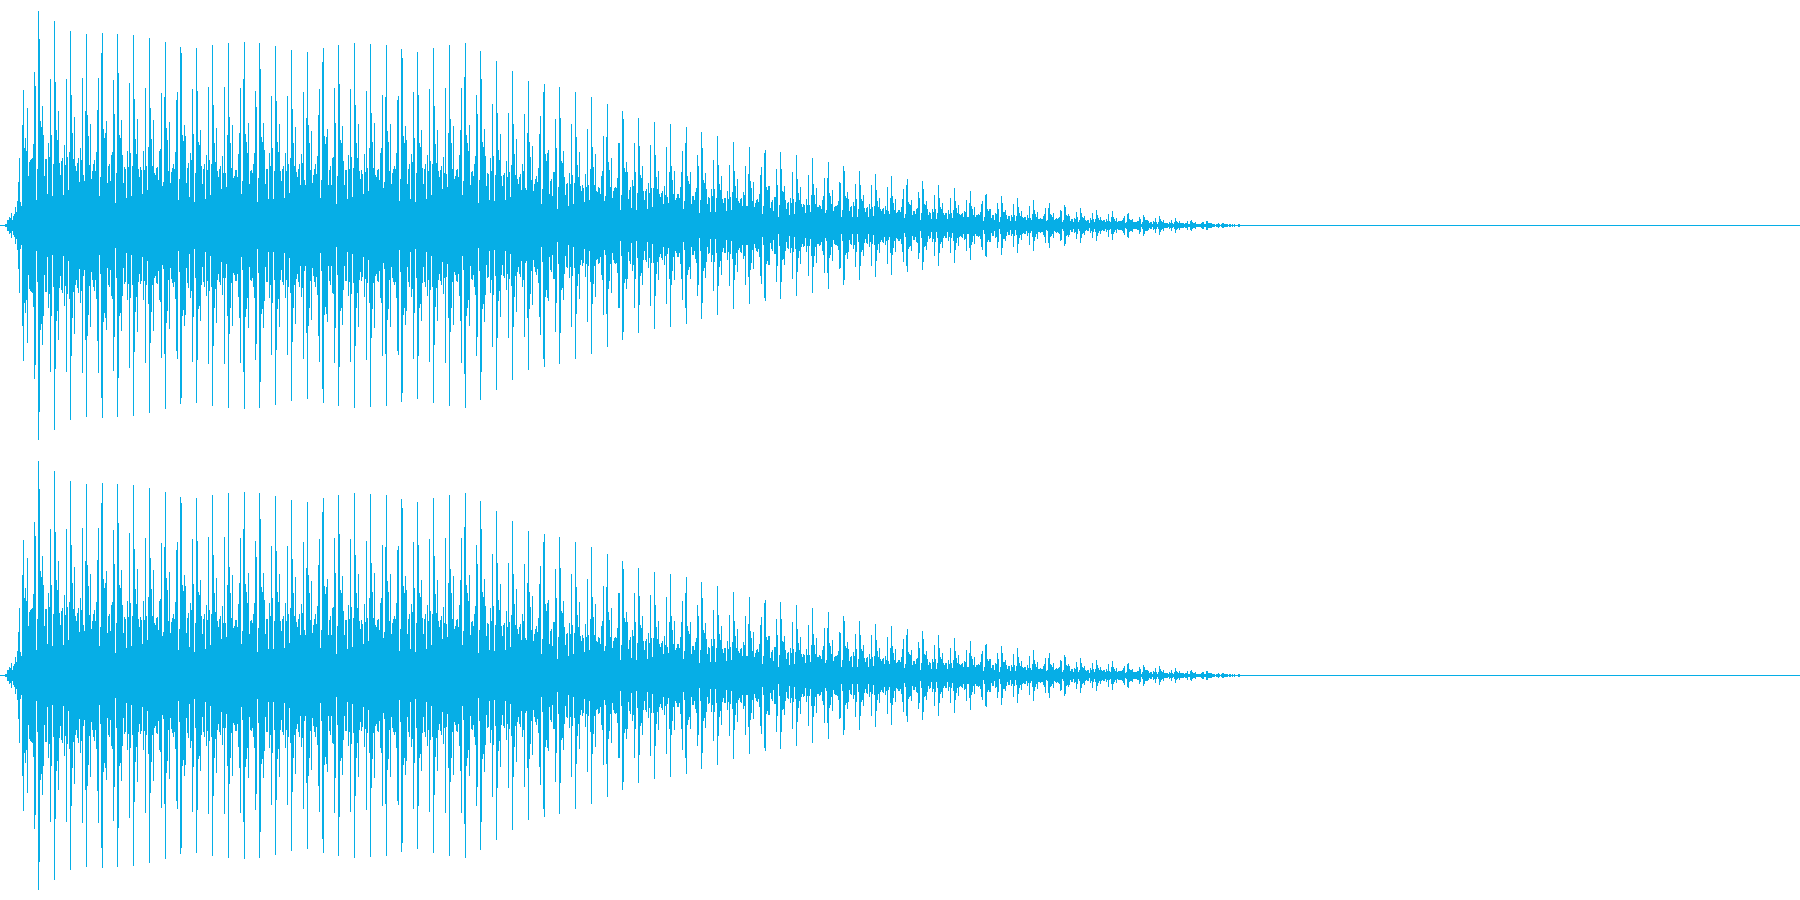 OctaveCom アプリ用タッチ音6の再生済みの波形